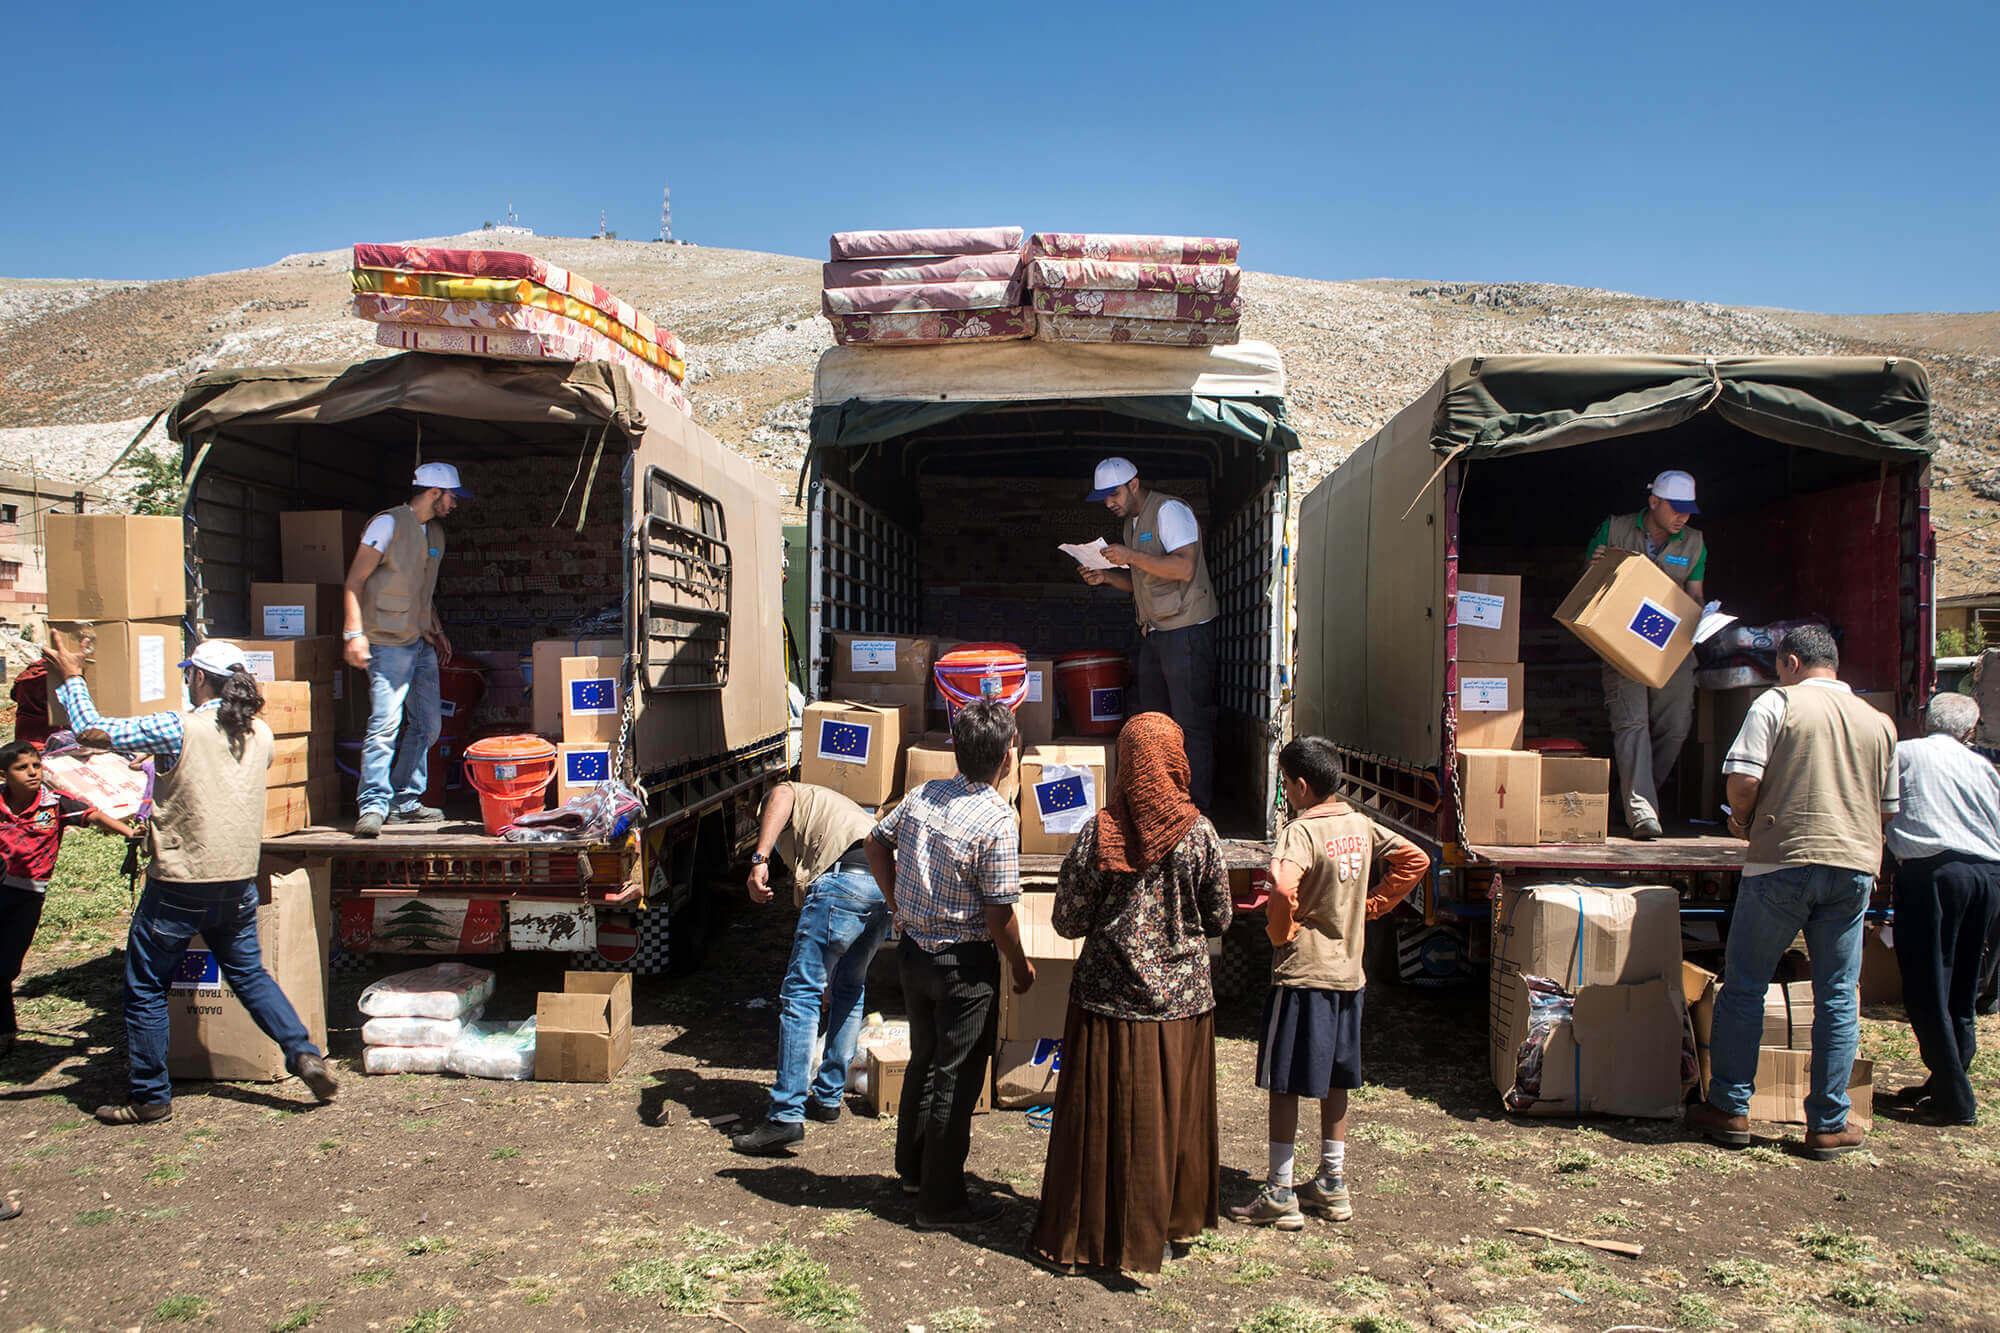 Urgence Syrie / Liban, Plaine de la Beeka